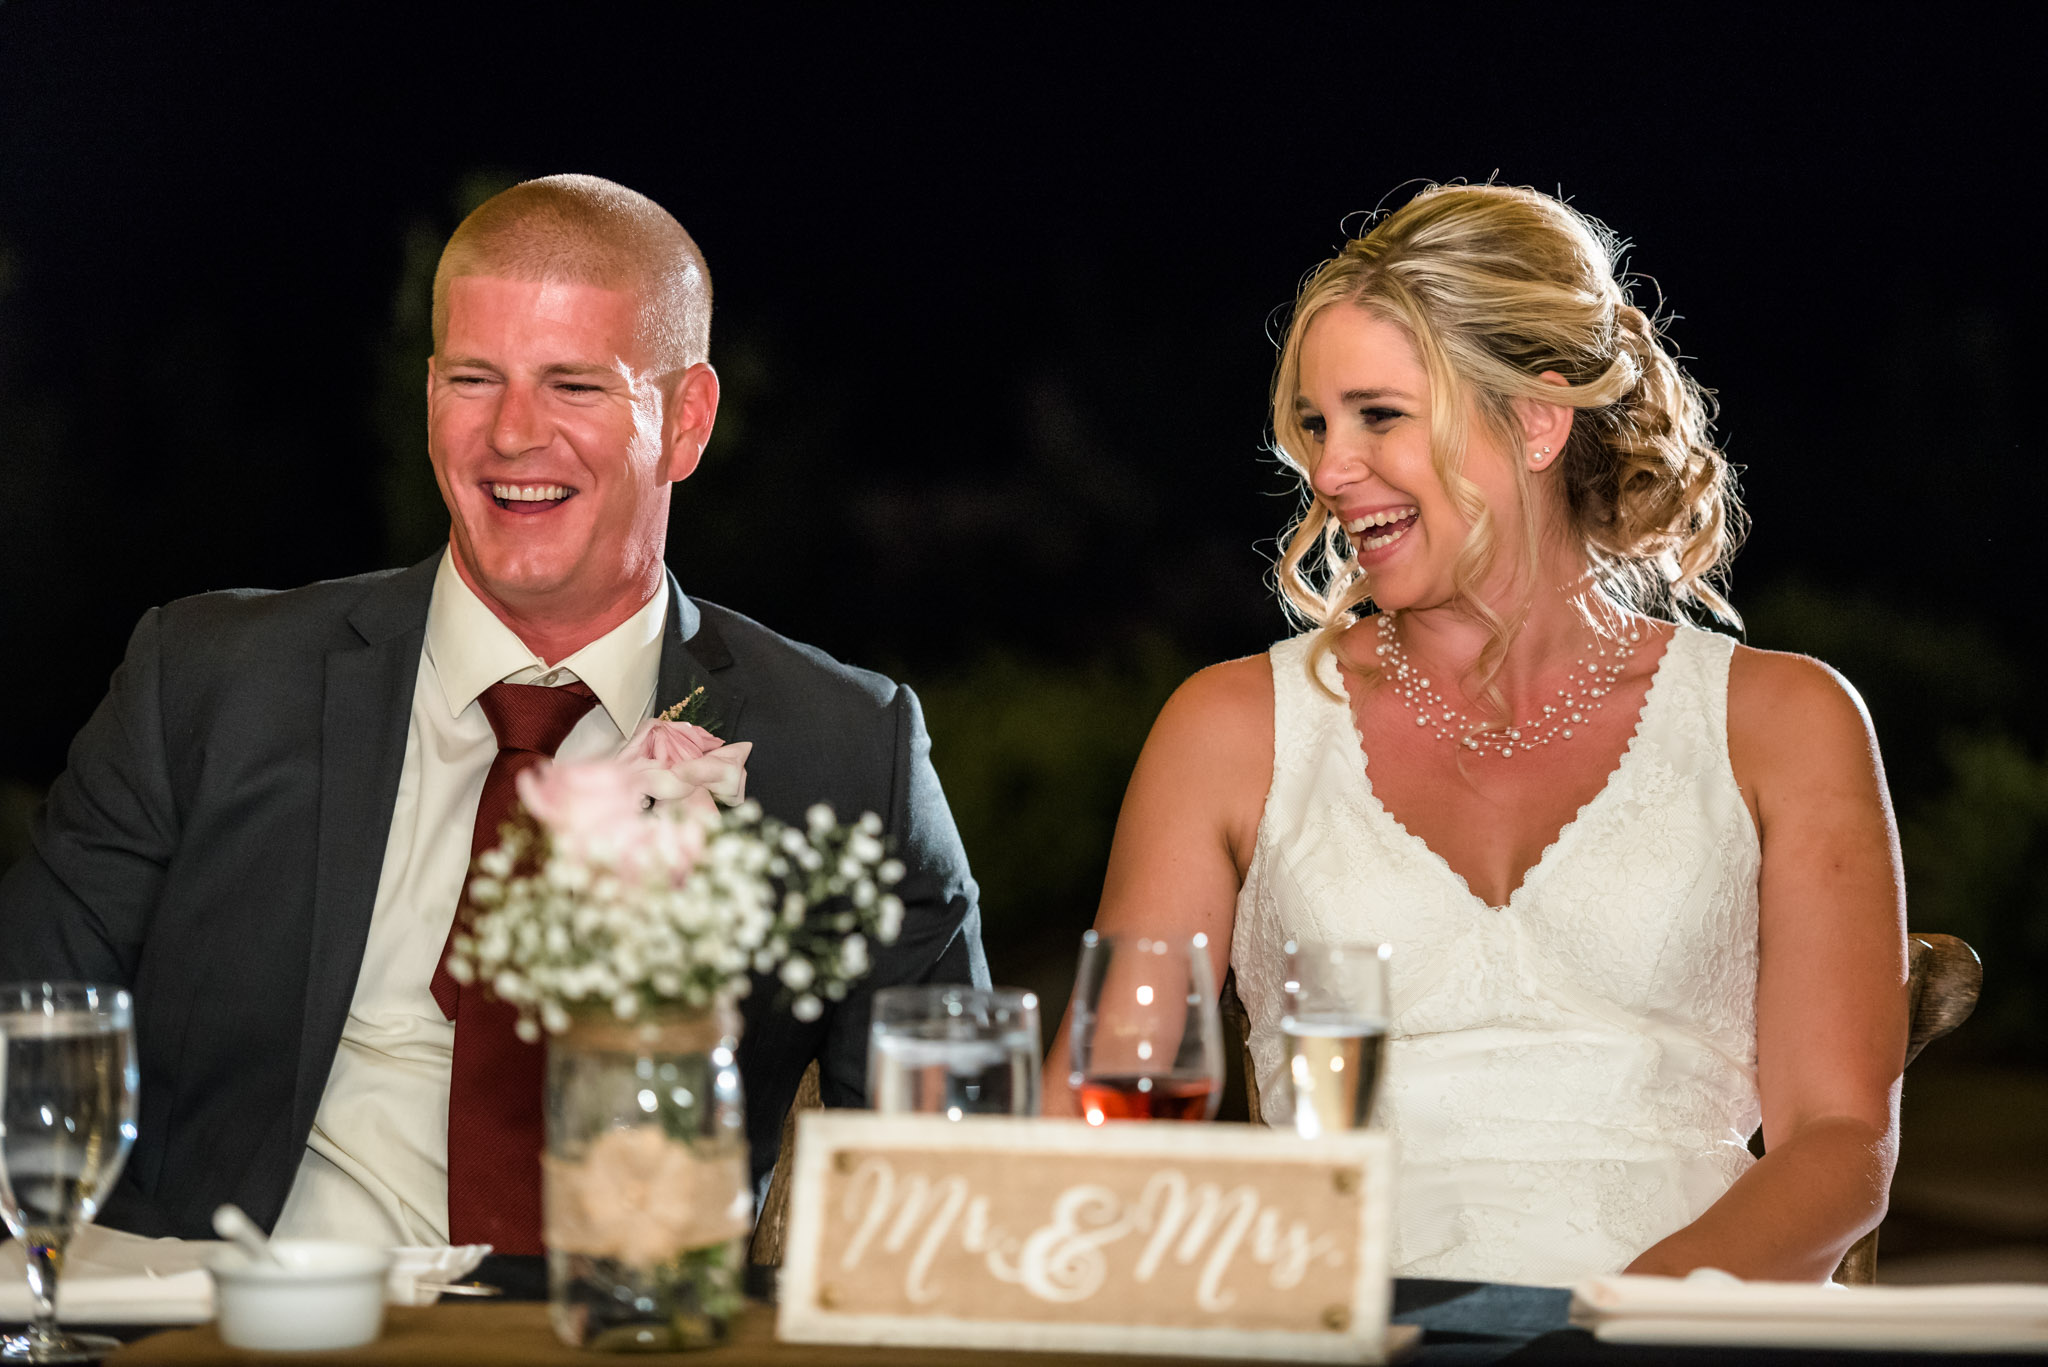 Avensole-Winery-Temecula-Wedding-Josh-and-Olivia-4050.JPG